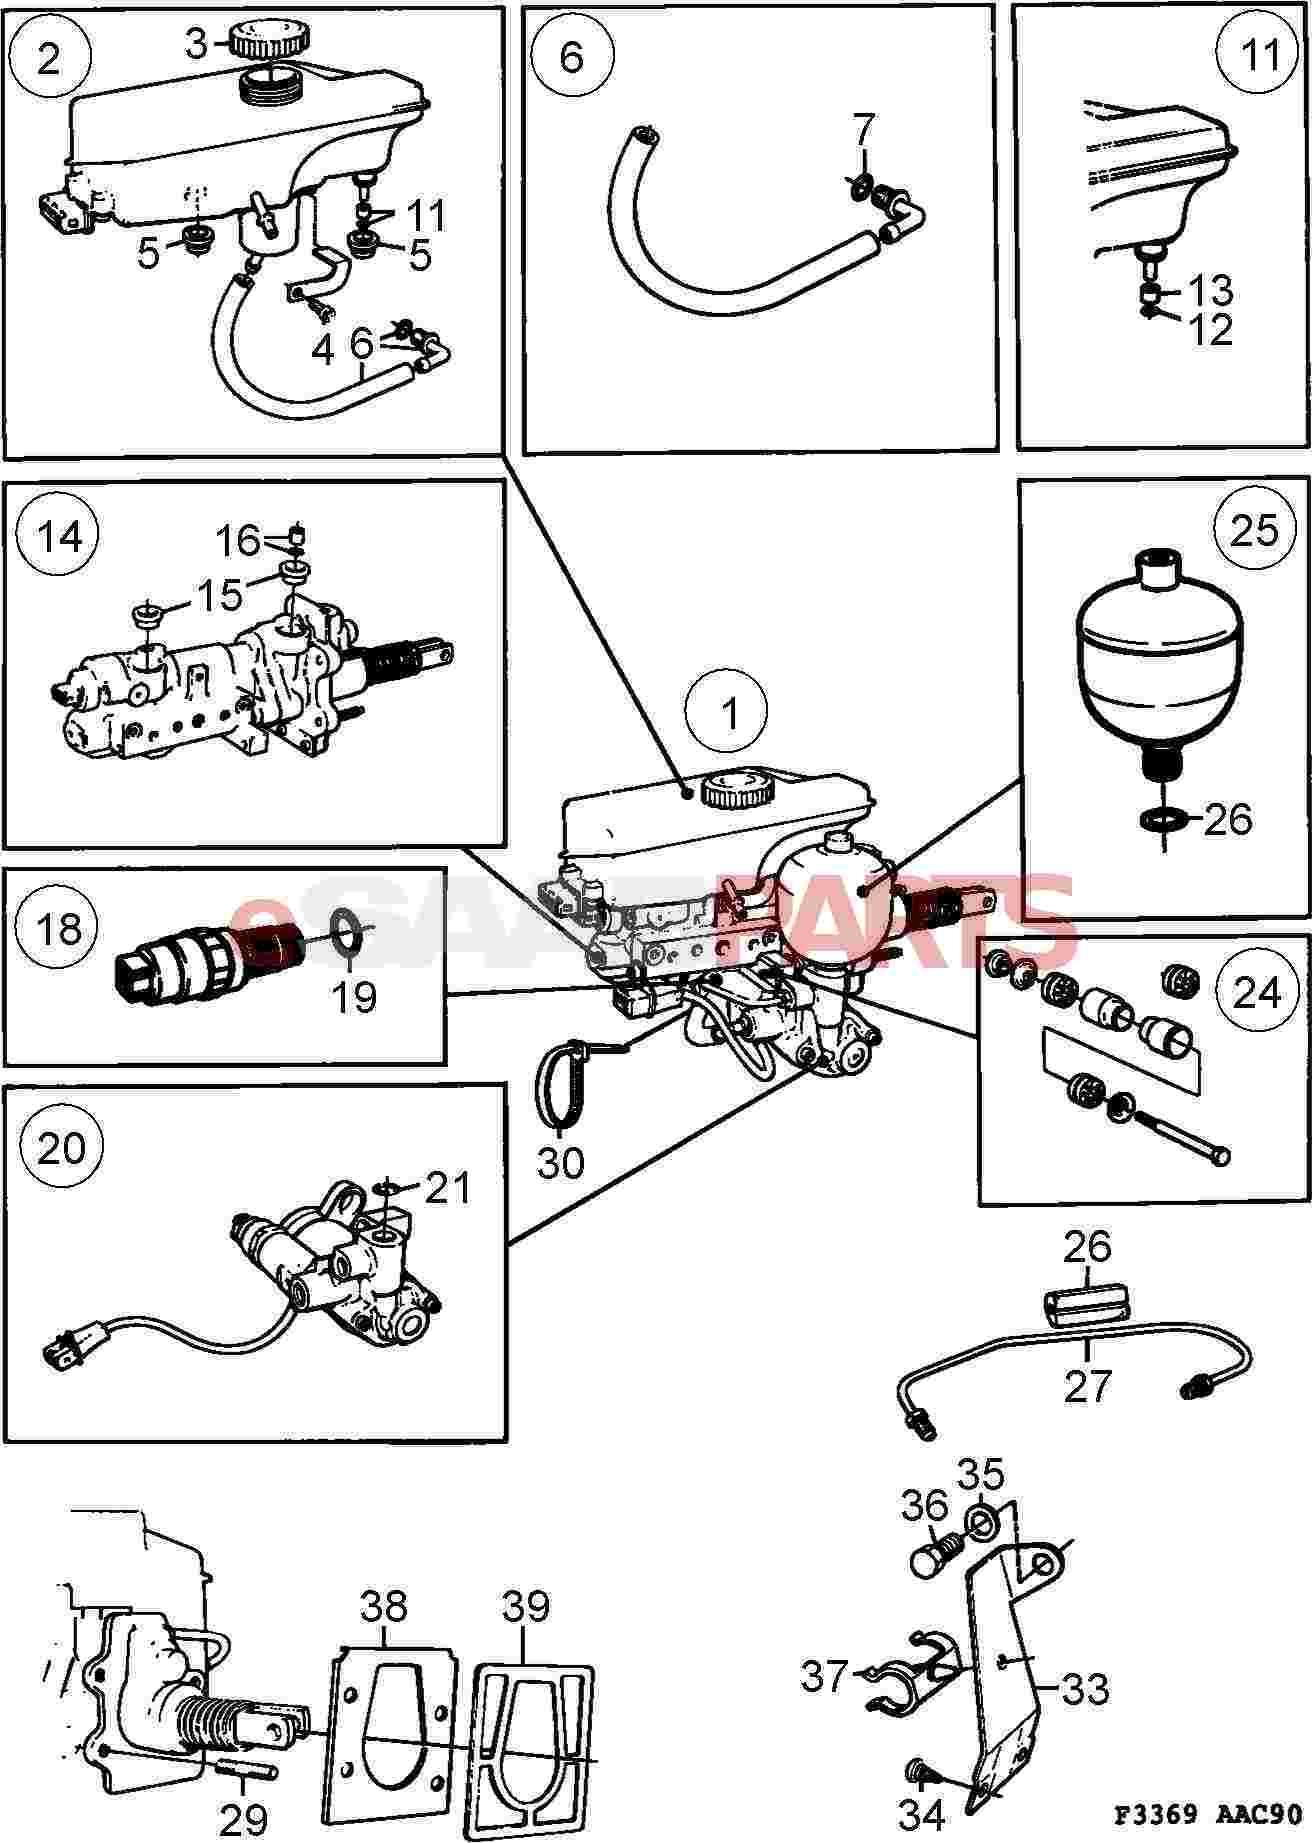 1995 saab 9000 parts diagram  saab  auto parts catalog and